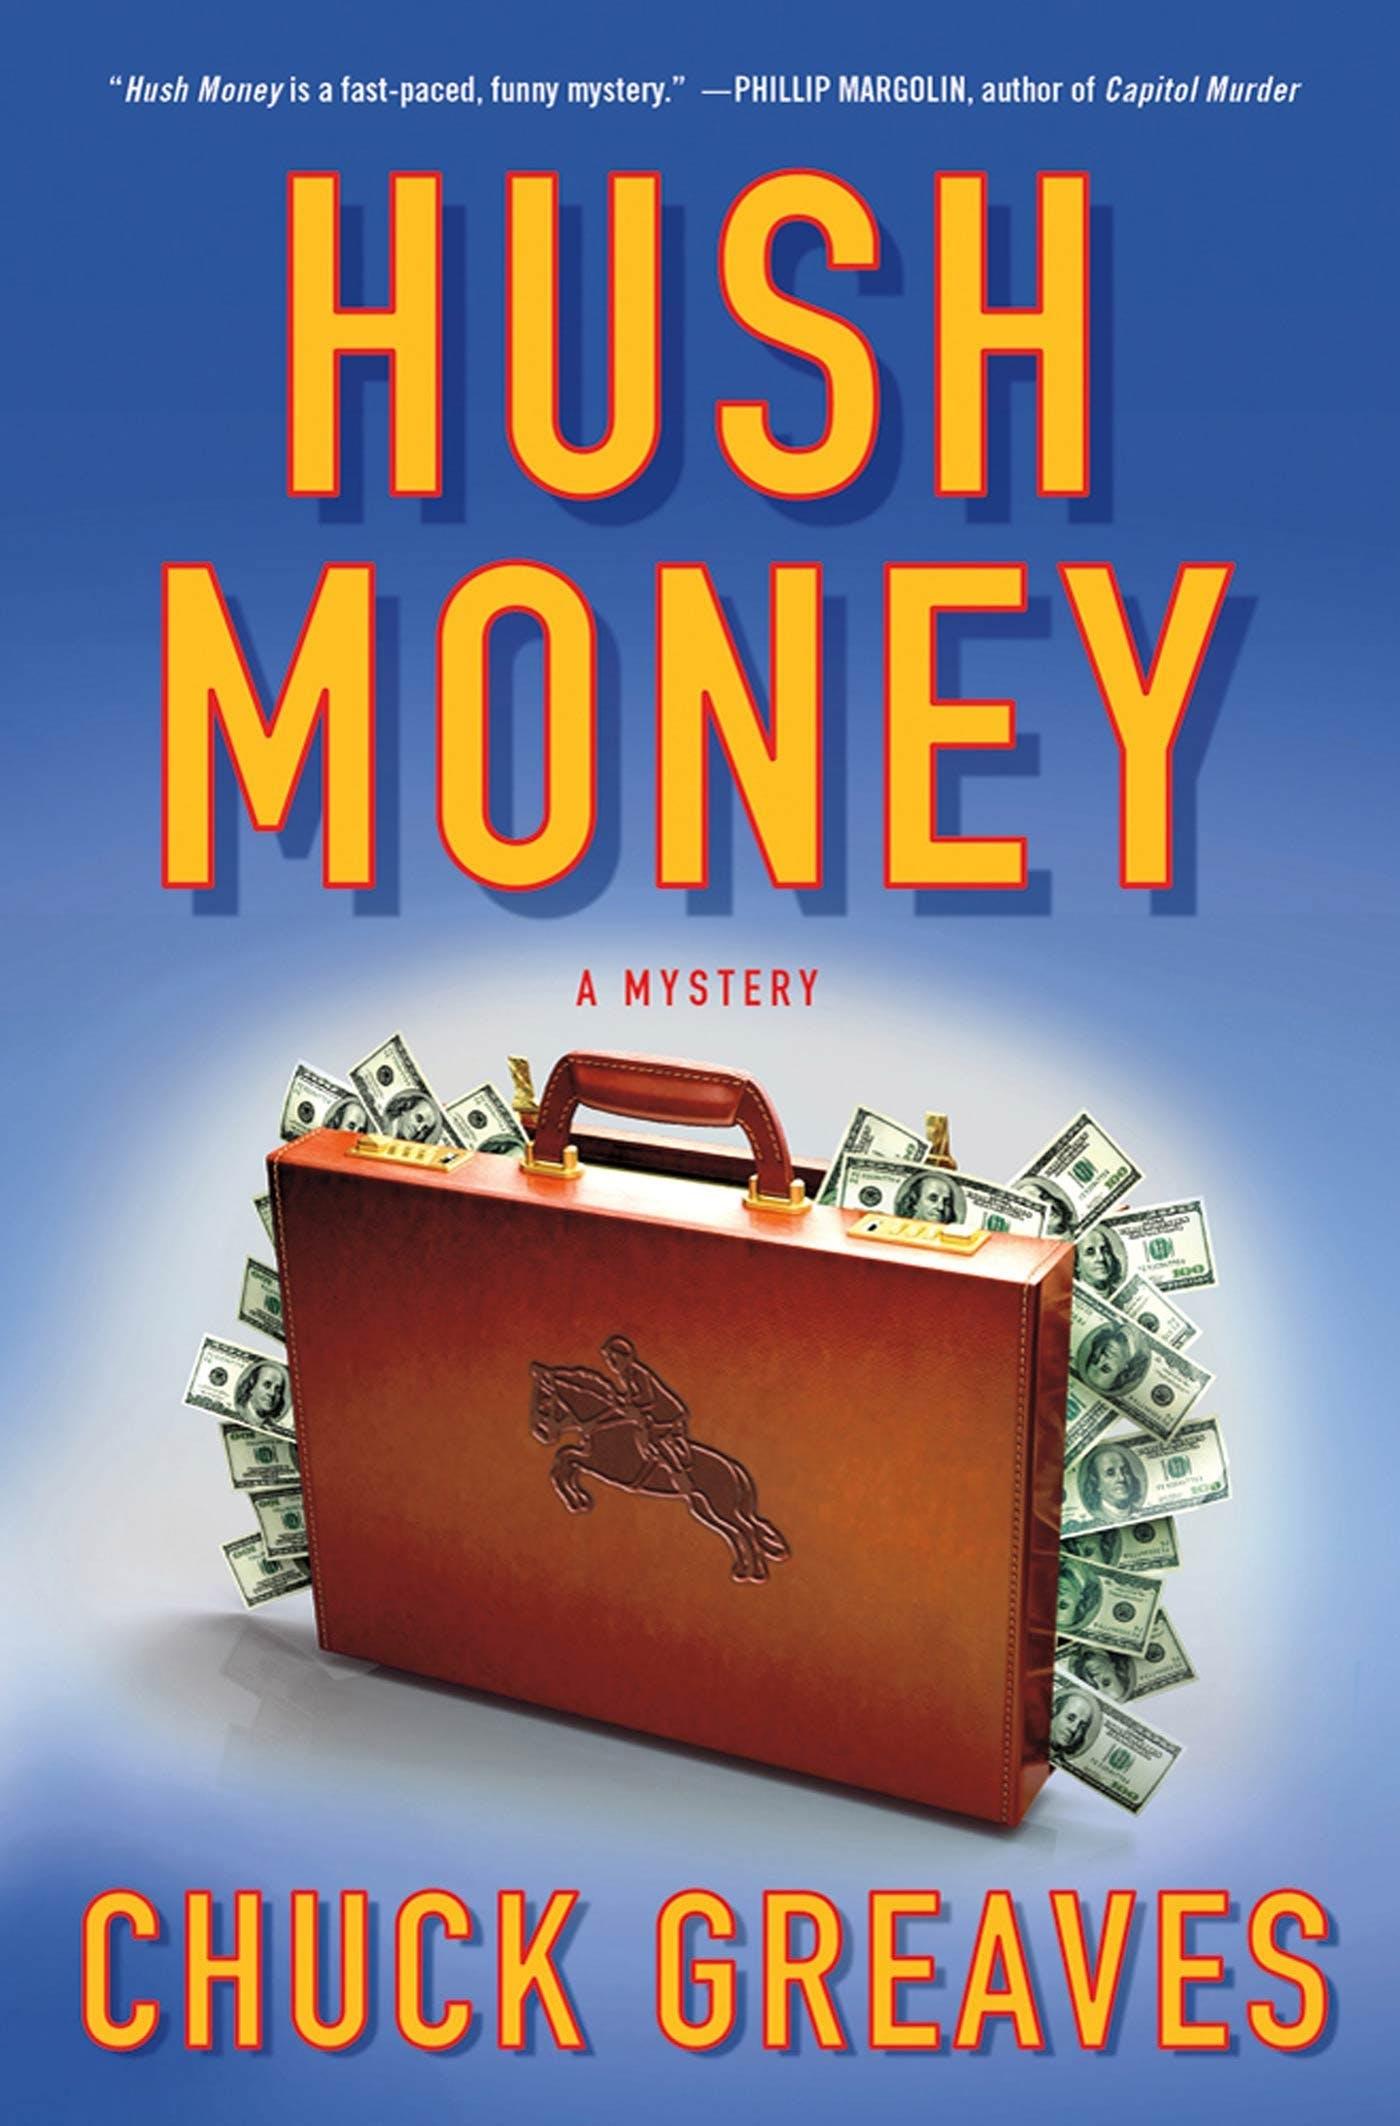 Image of Hush Money